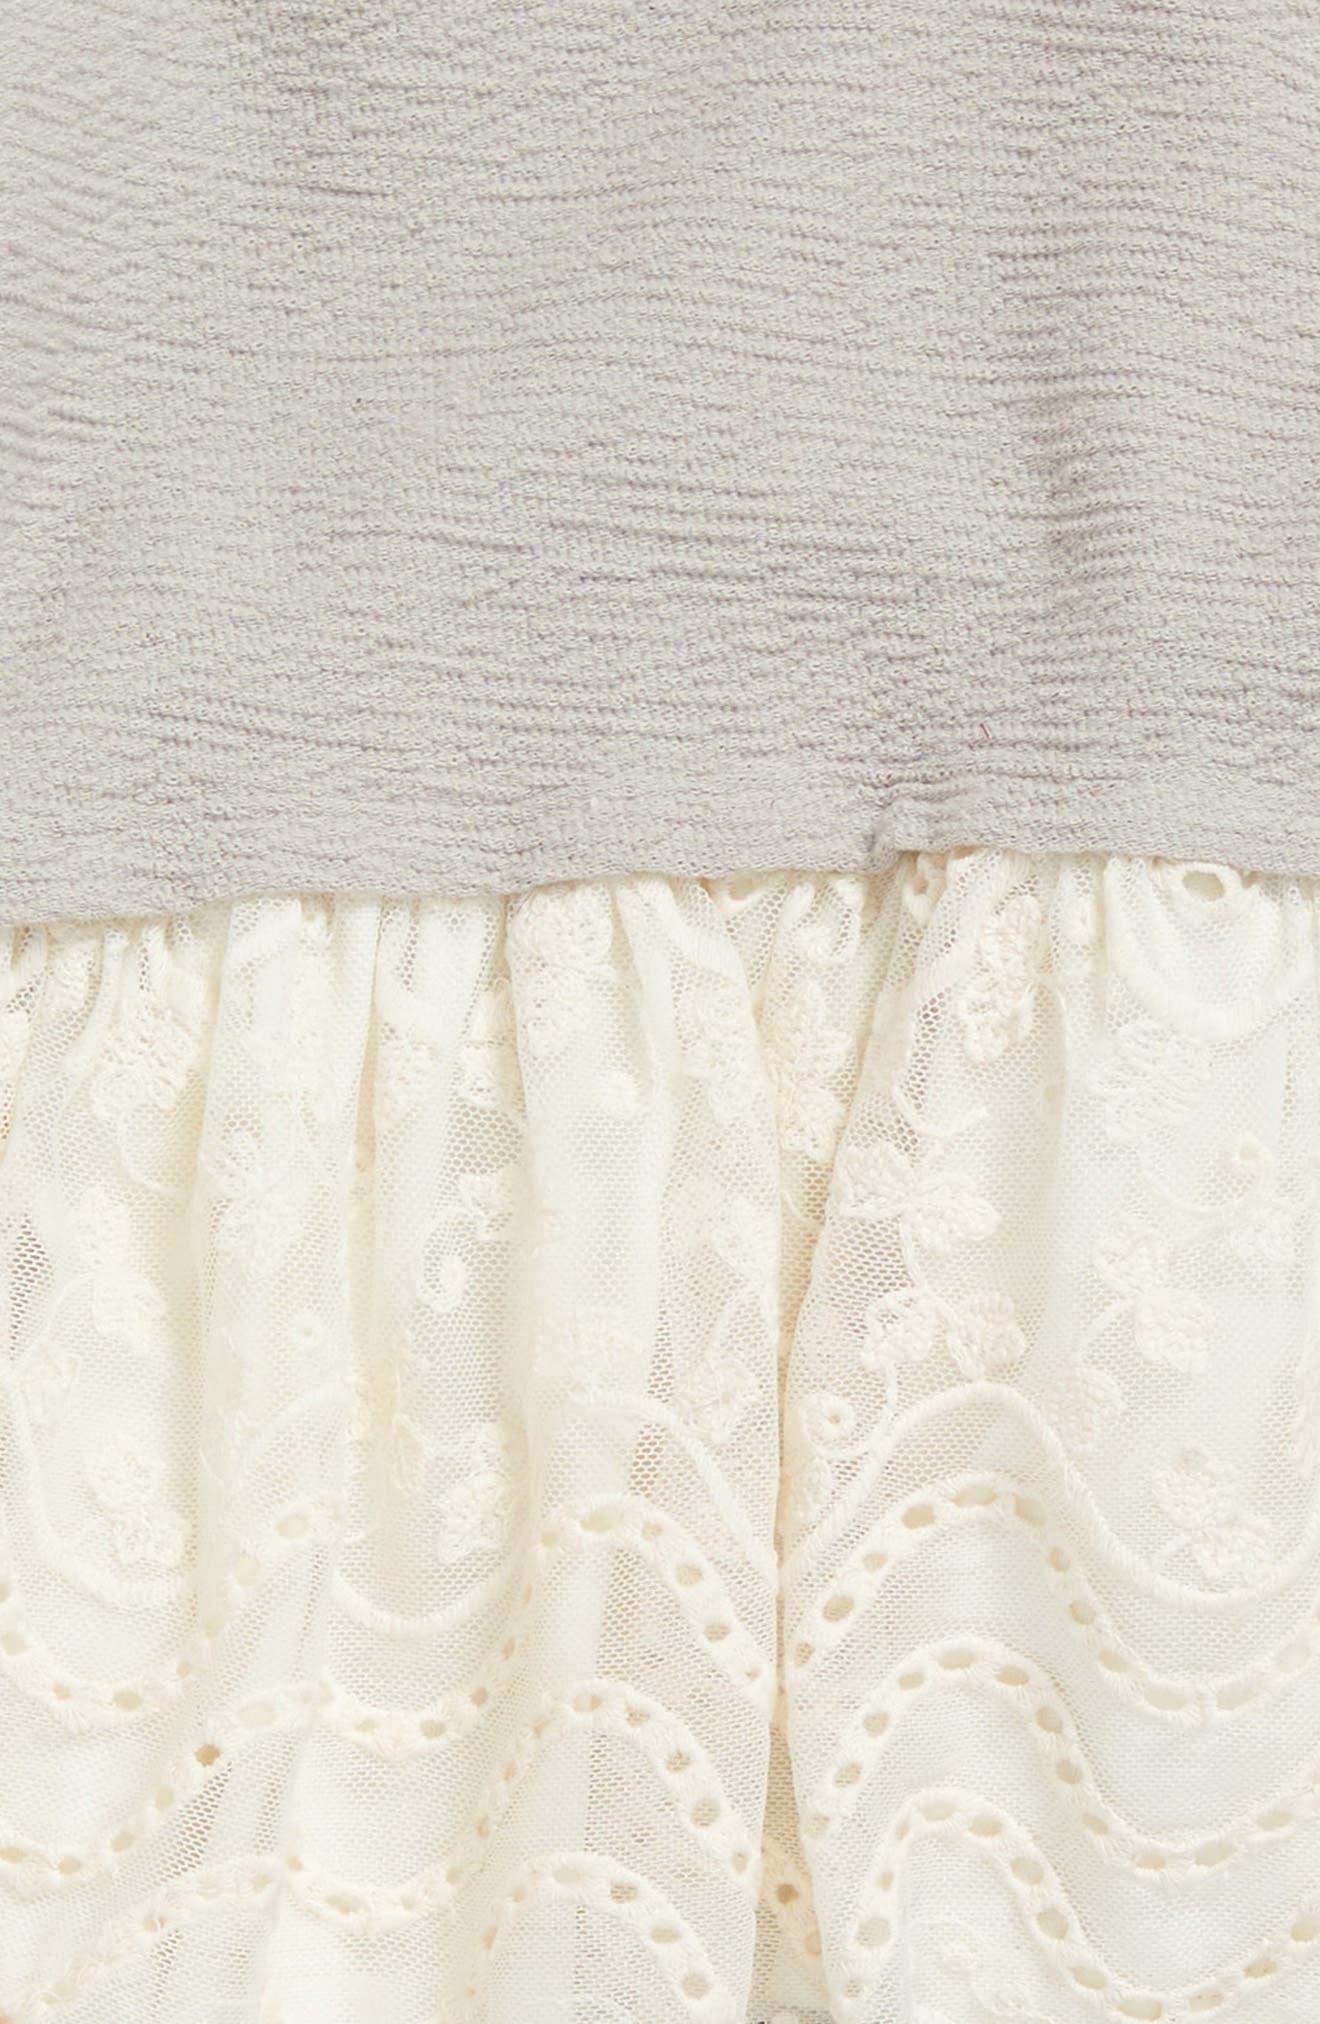 Lace Peplum Top & Leggings Set,                             Alternate thumbnail 2, color,                             Light Grey